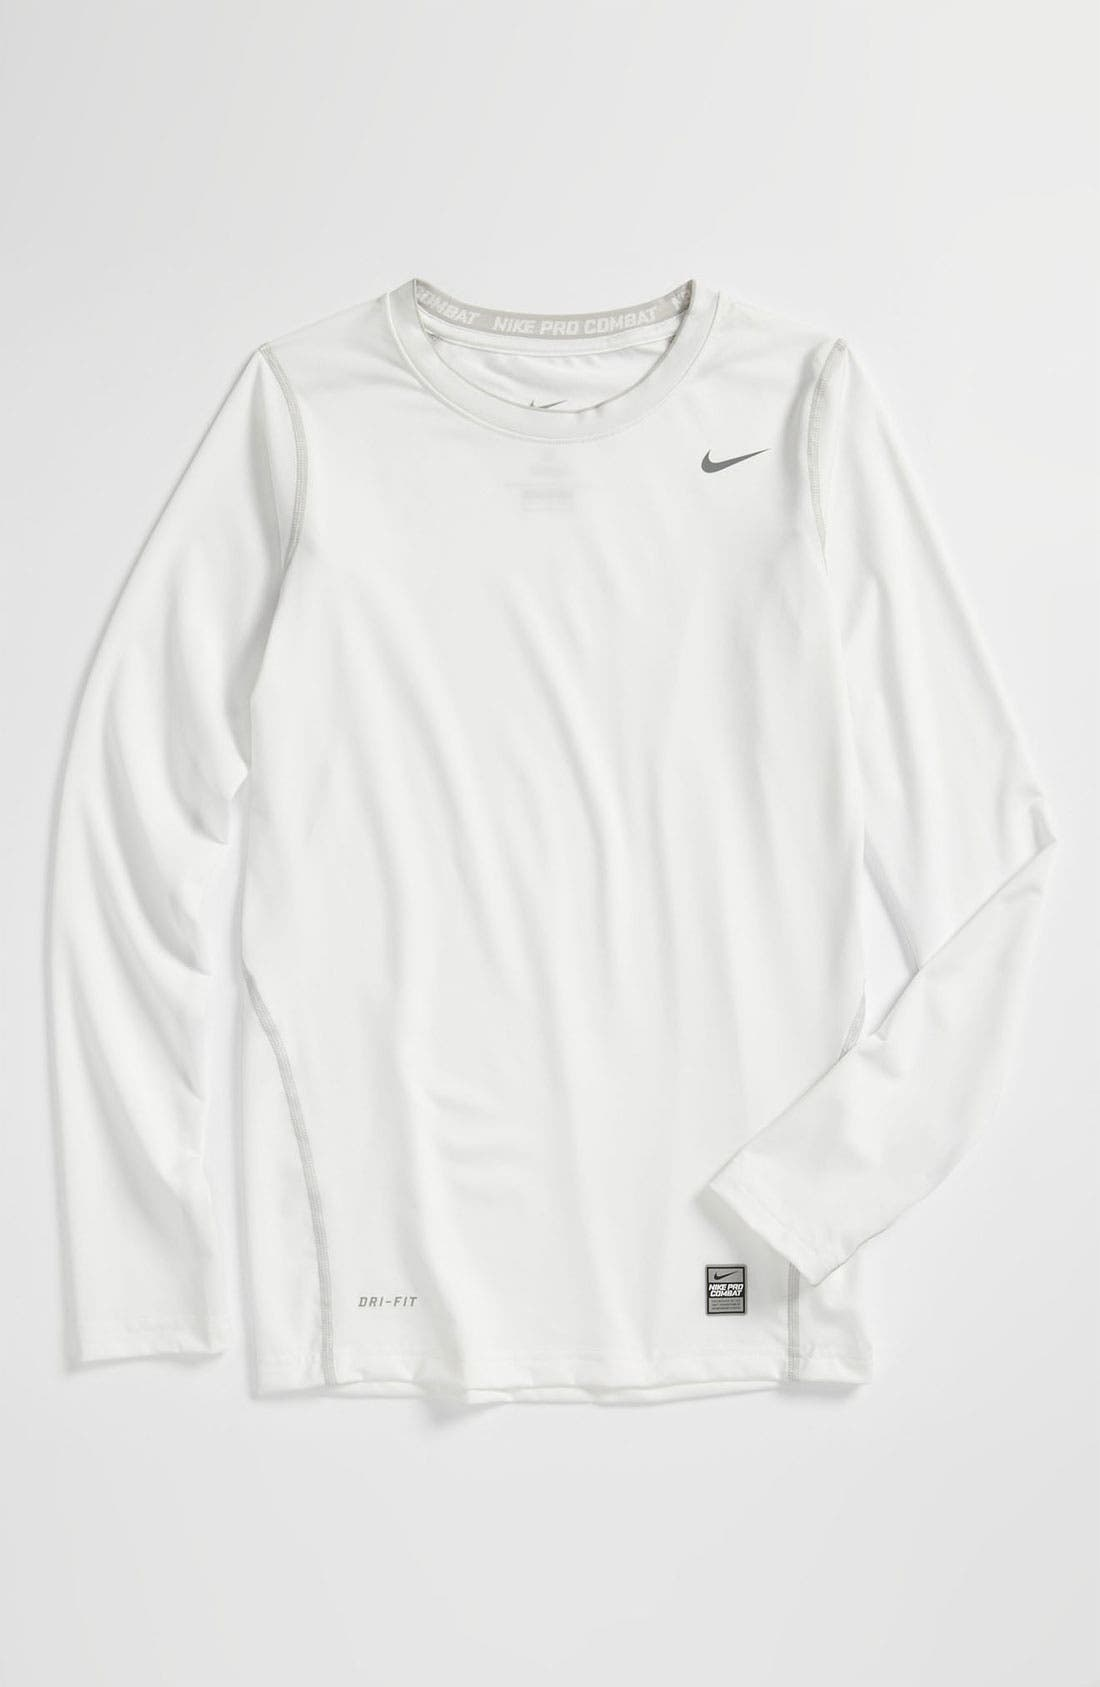 Main Image - Nike 'Core Compression' Top (Big Boys)